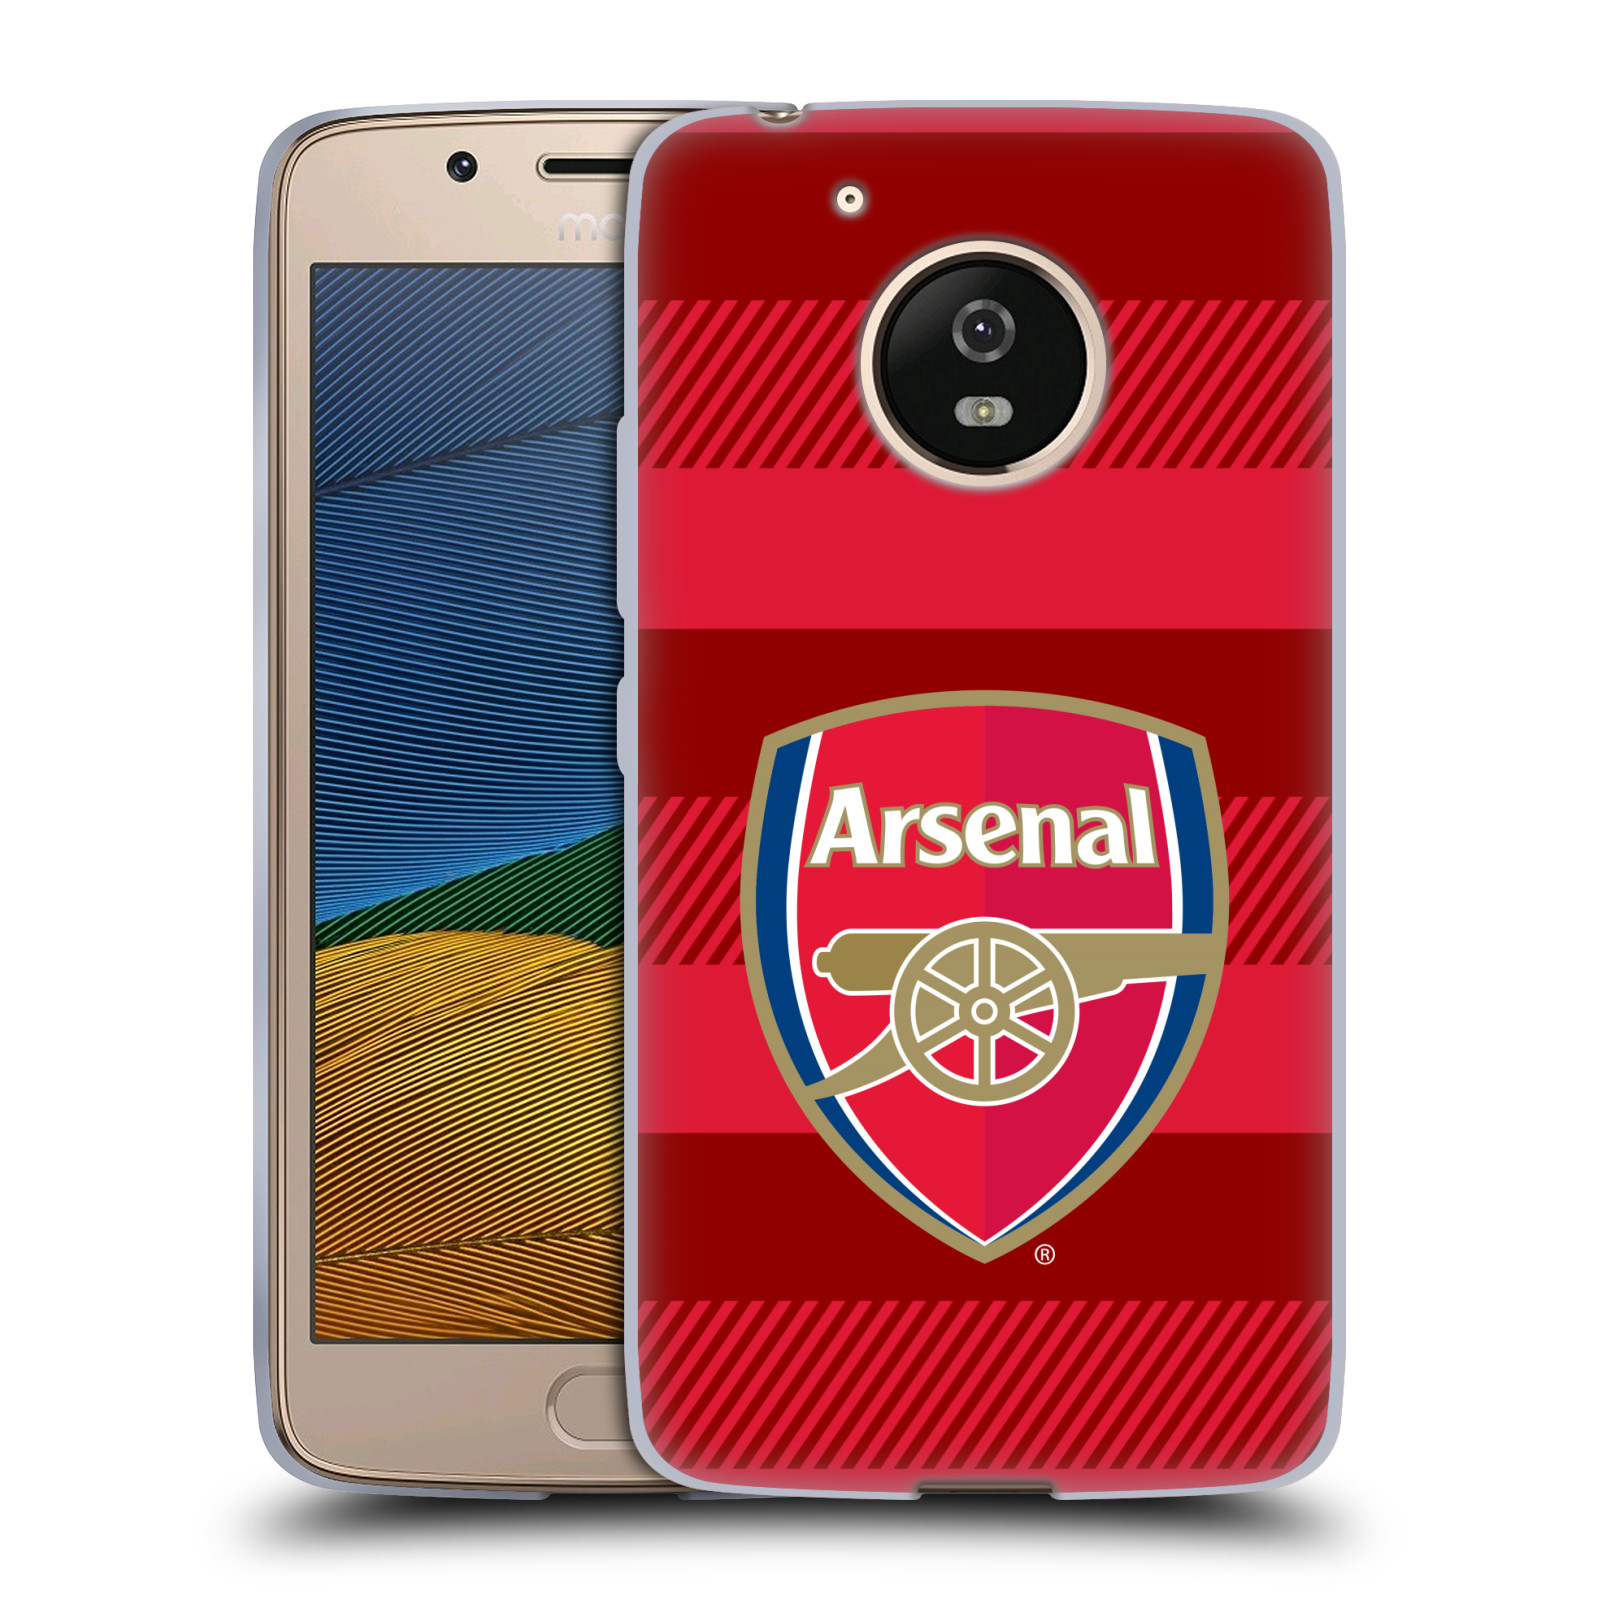 Silikonové pouzdro na mobil Lenovo Moto G5 - Head Case - Arsenal FC - Logo s pruhy